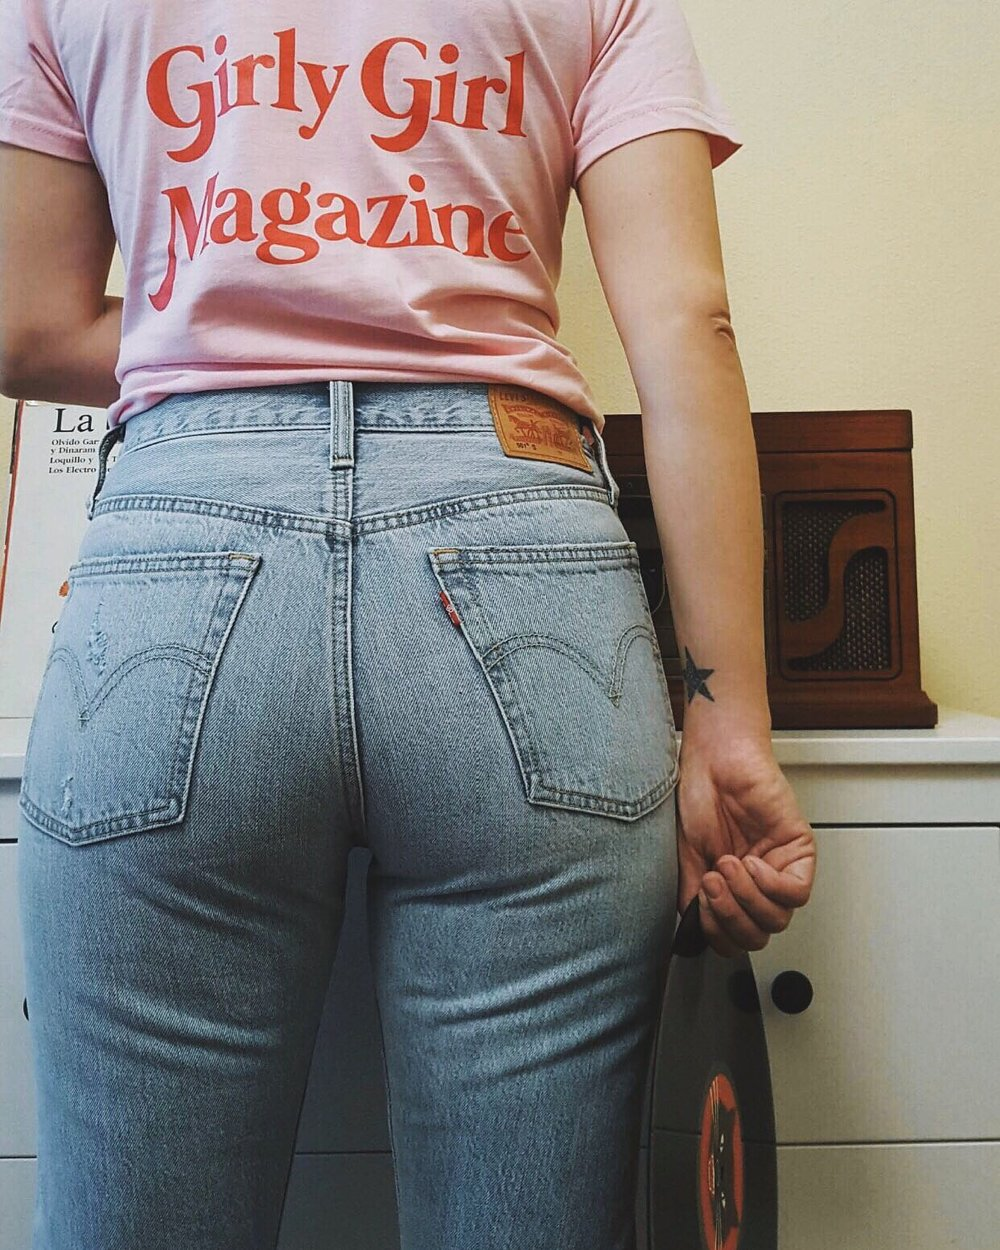 @mariylola